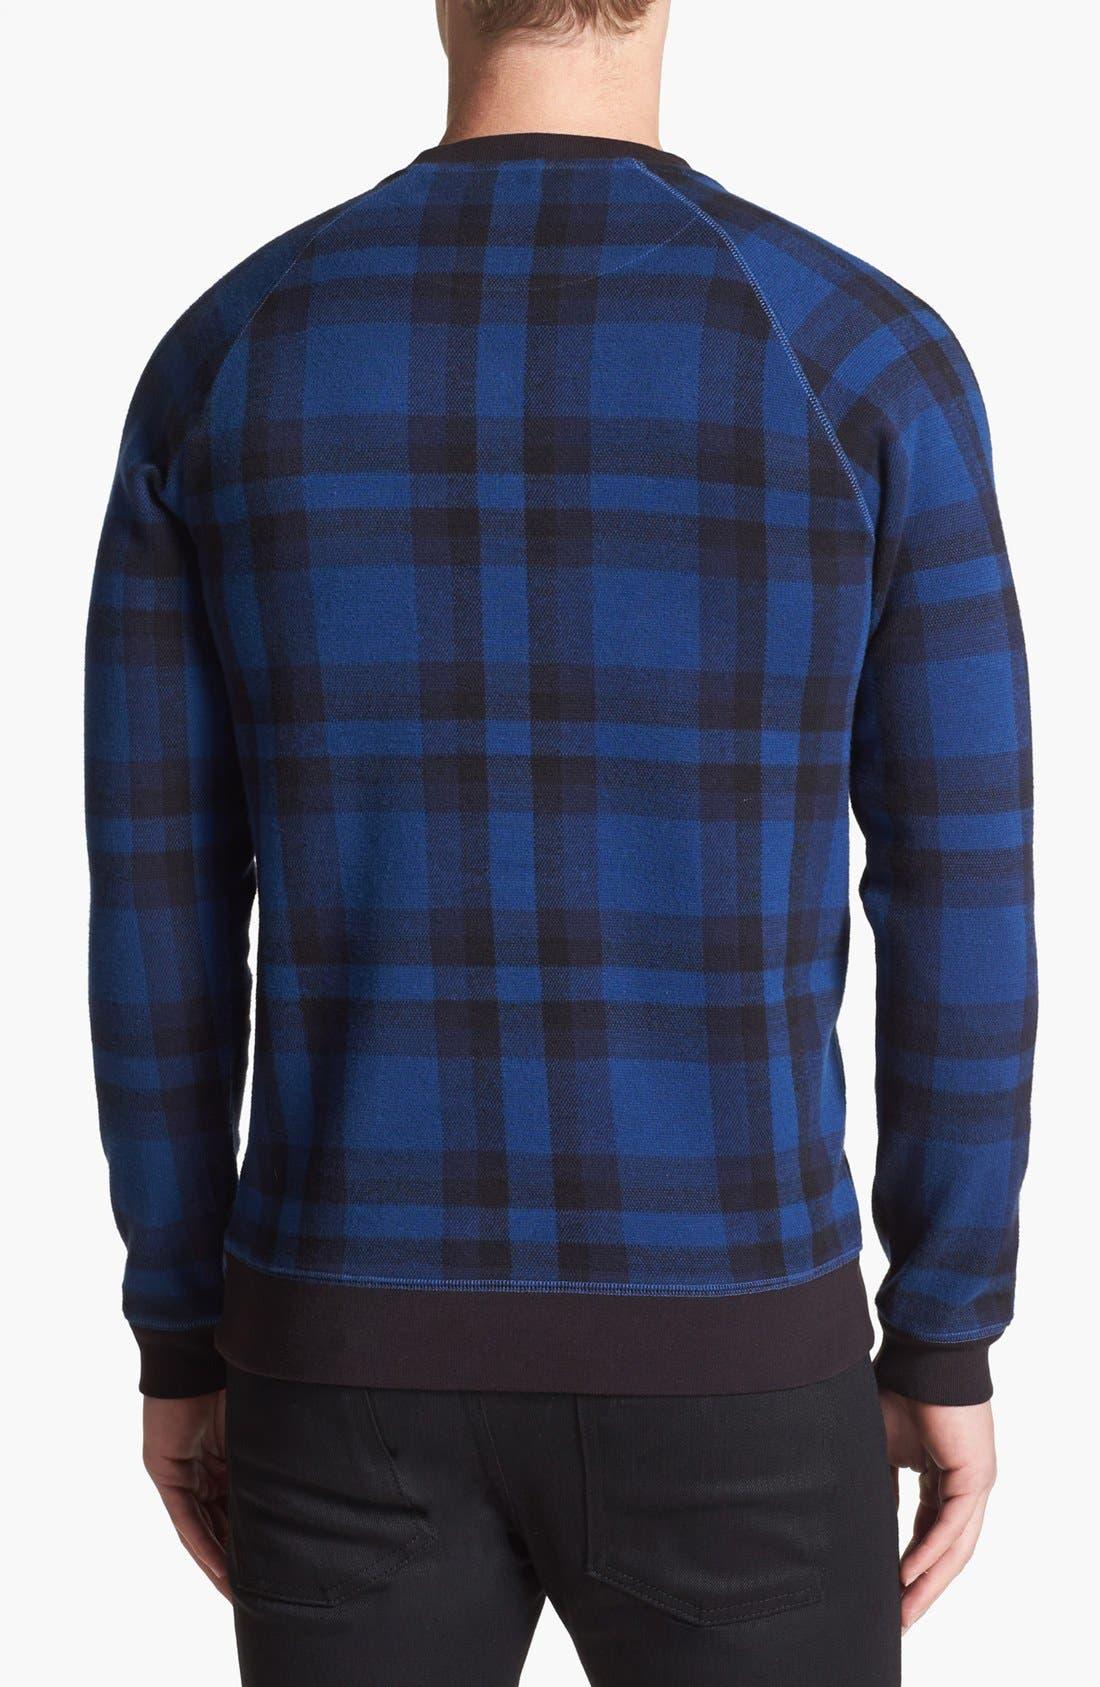 Alternate Image 2  - MARC BY MARC JACOBS 'Sheffield' Plaid Sweatshirt